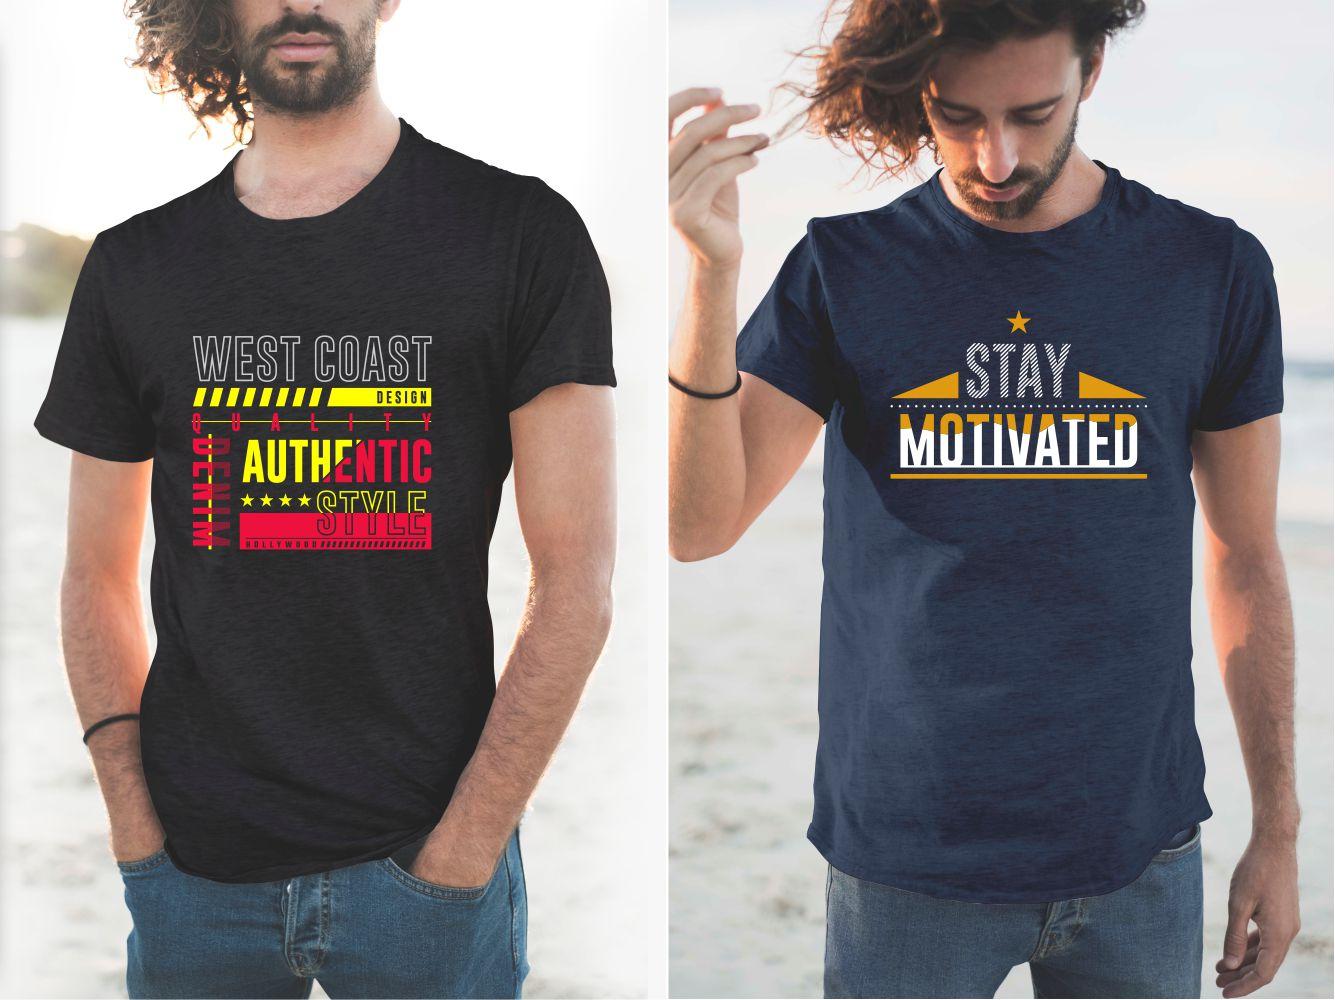 106 Urban T-shirt Designs Collection - 8 9